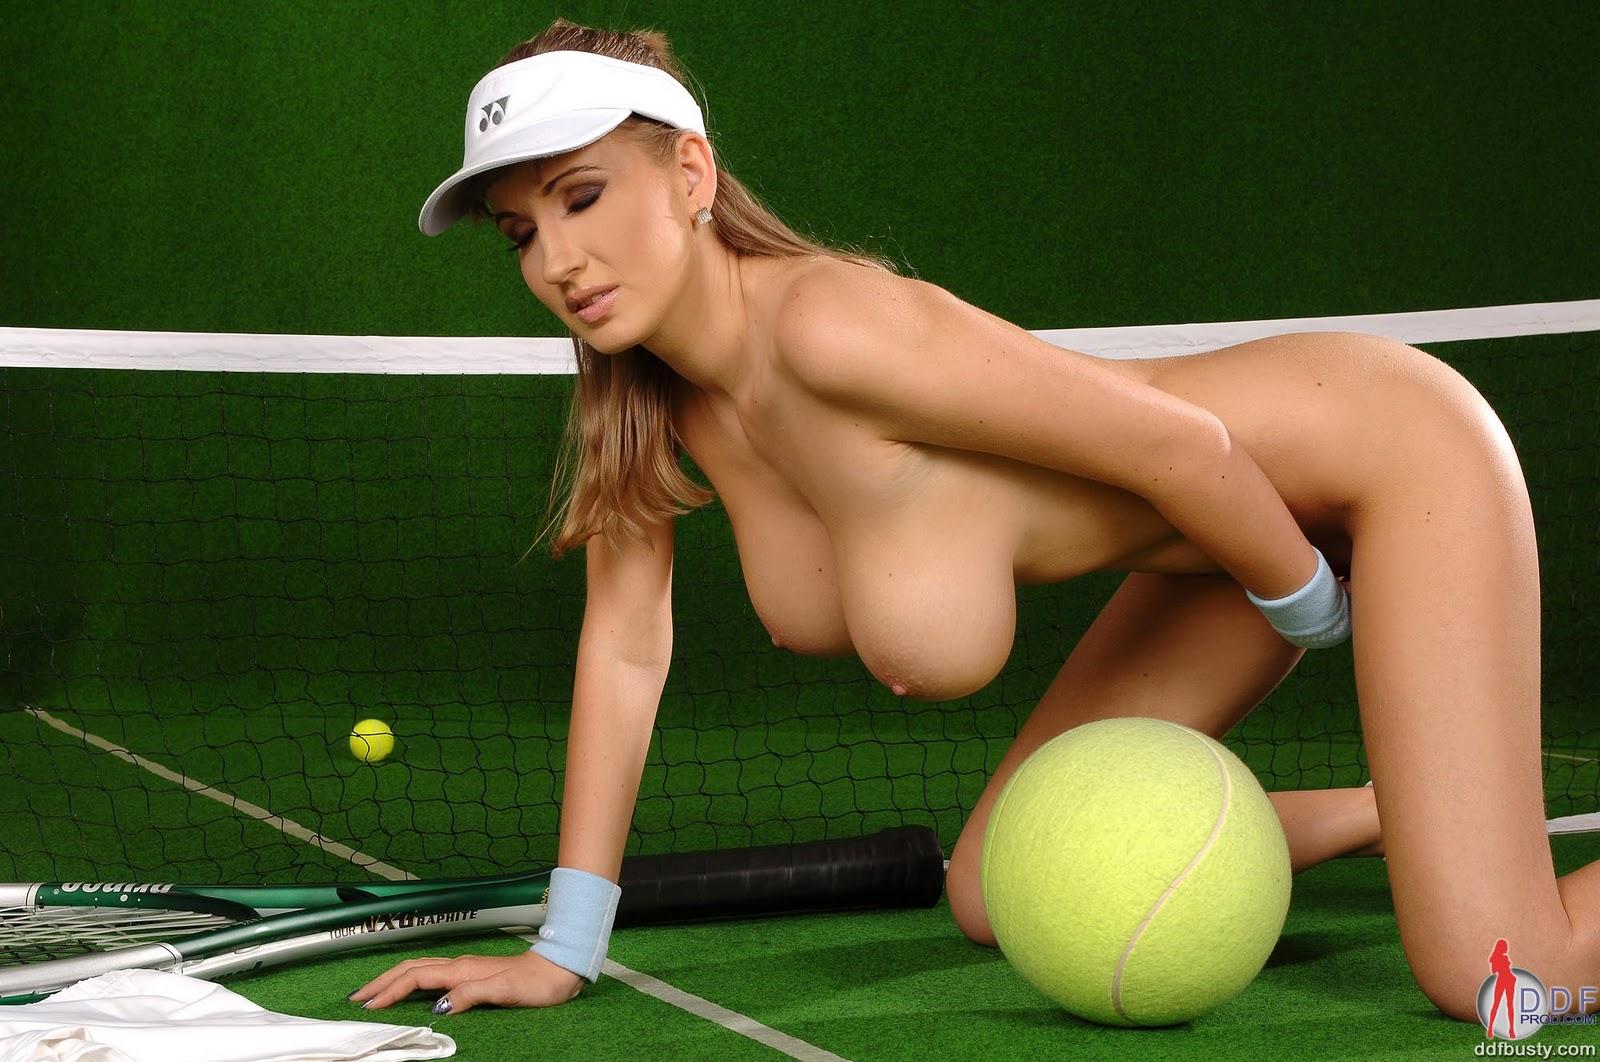 Теннисистка с сиськами 7 фотография